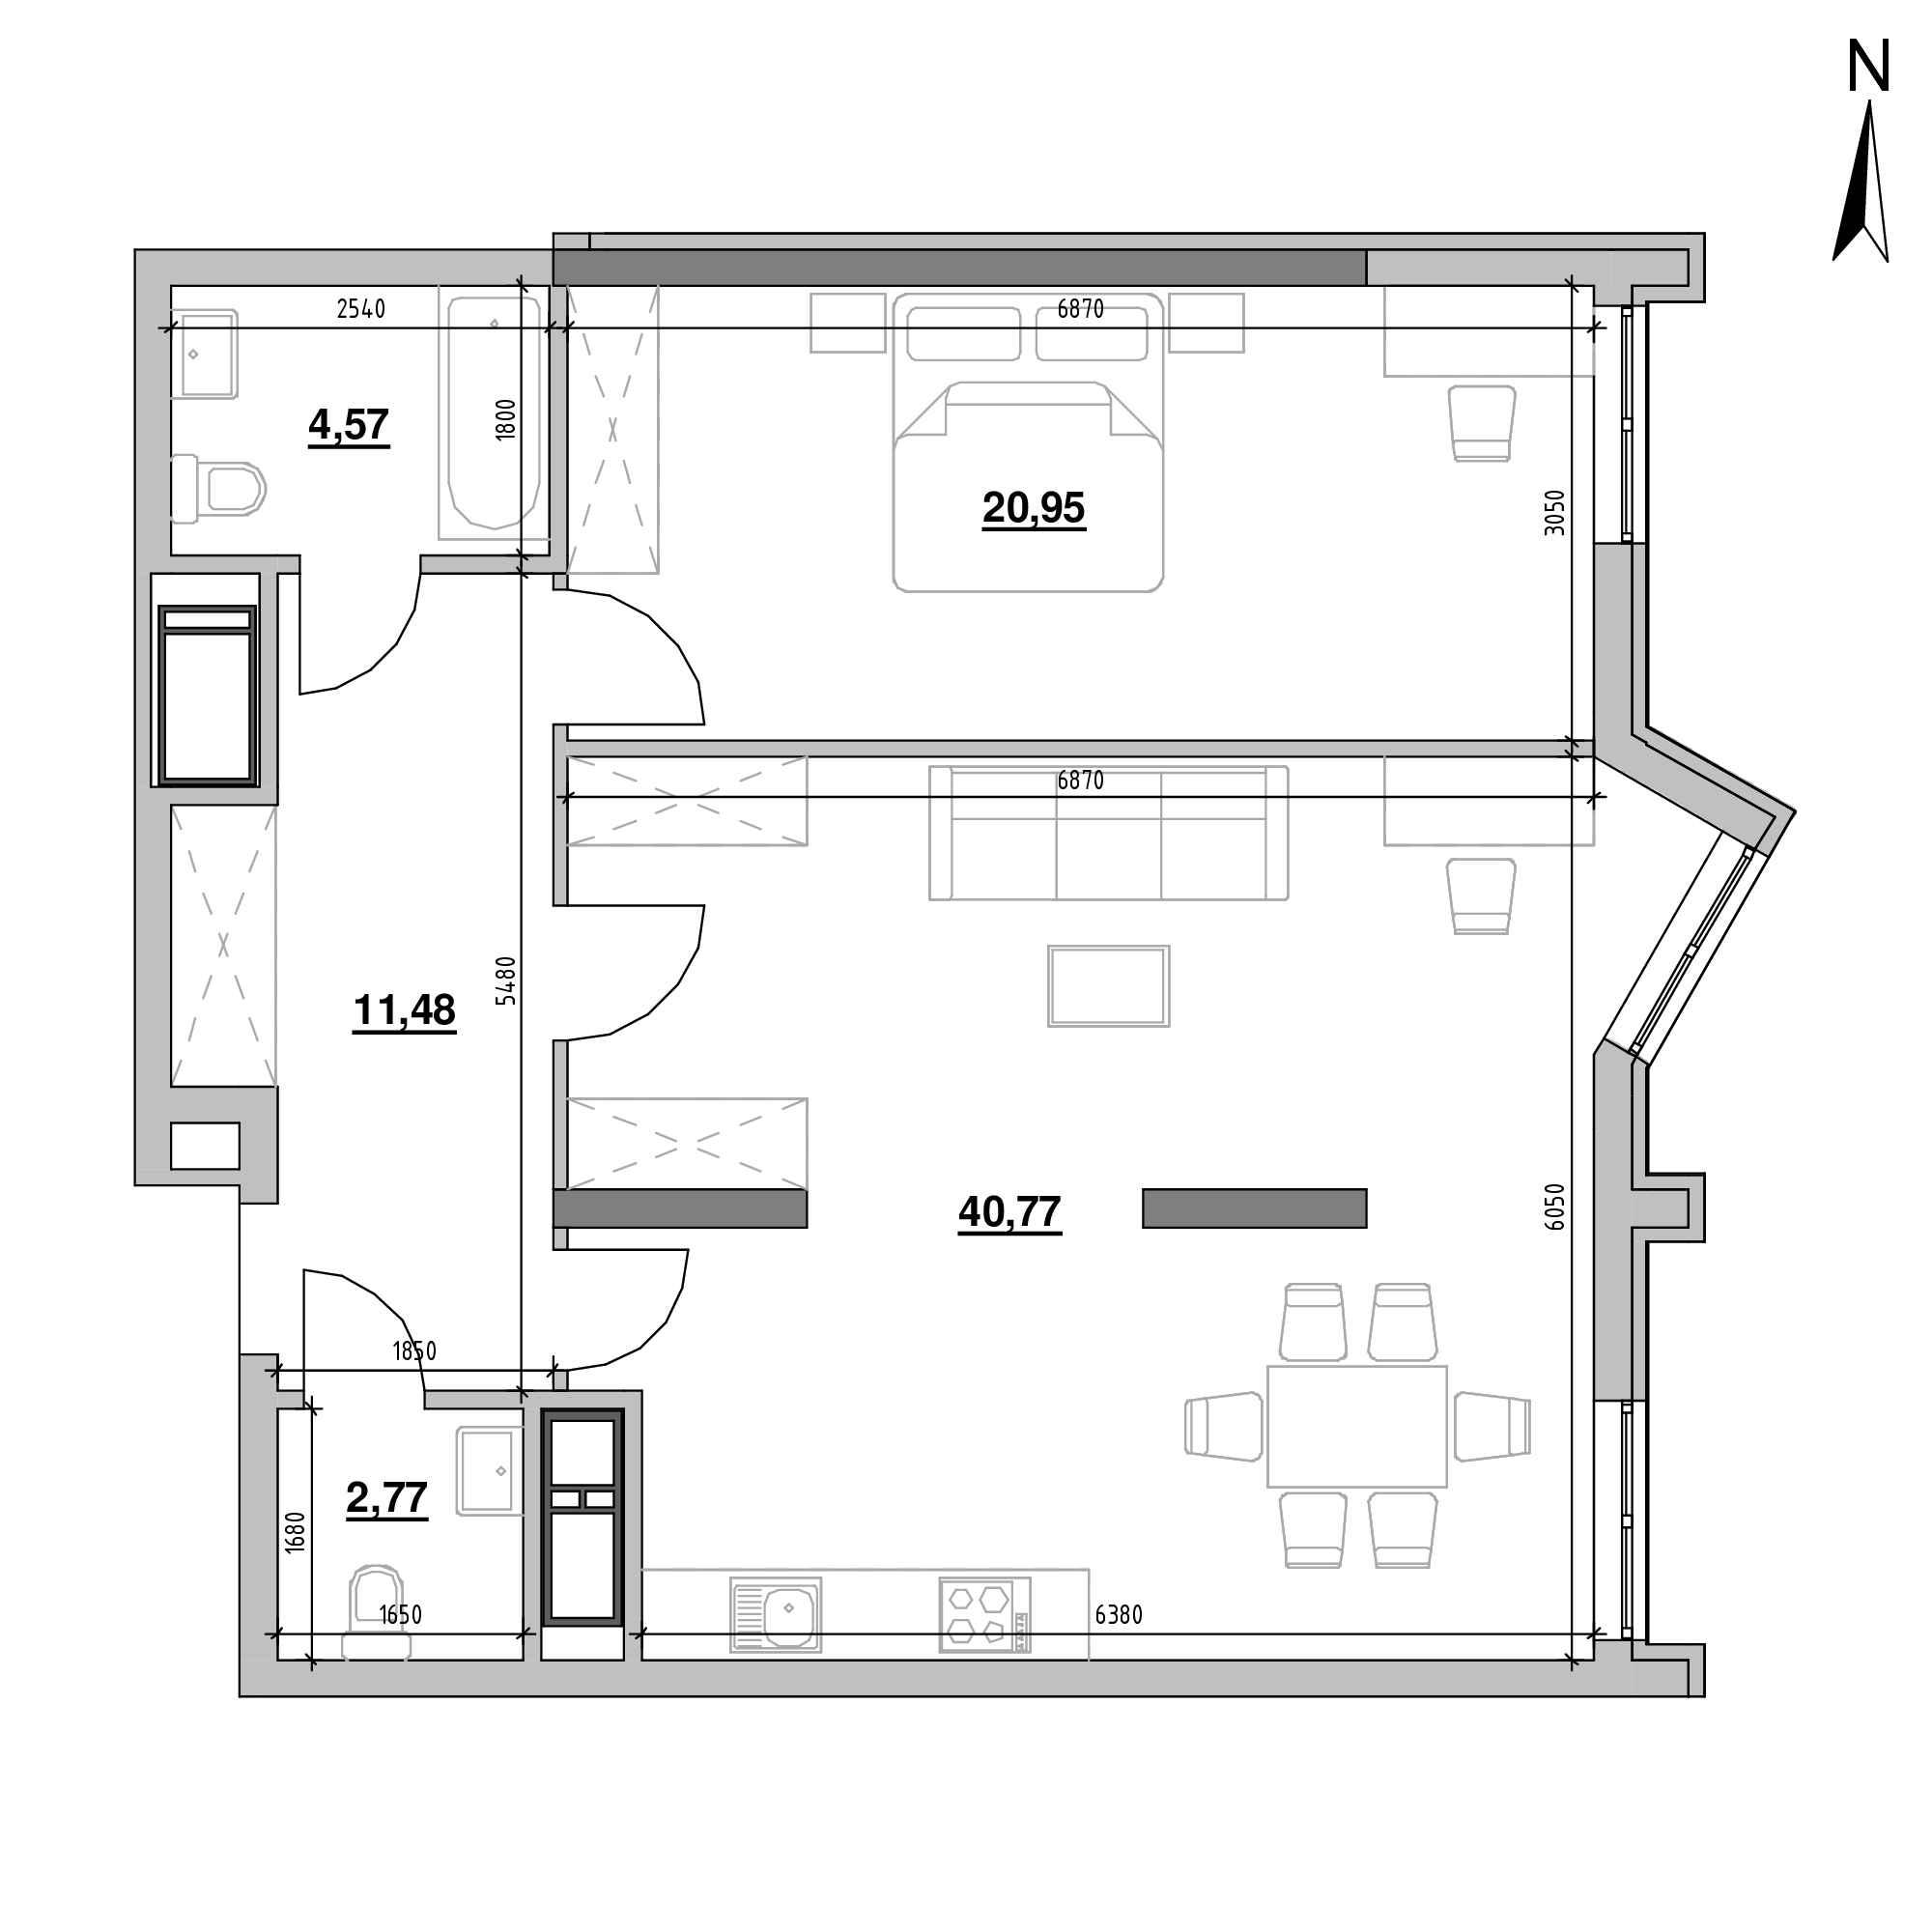 ЖК Nordica Residence: планування 1-кімнатної квартири, №44, 80.54 м<sup>2</sup>